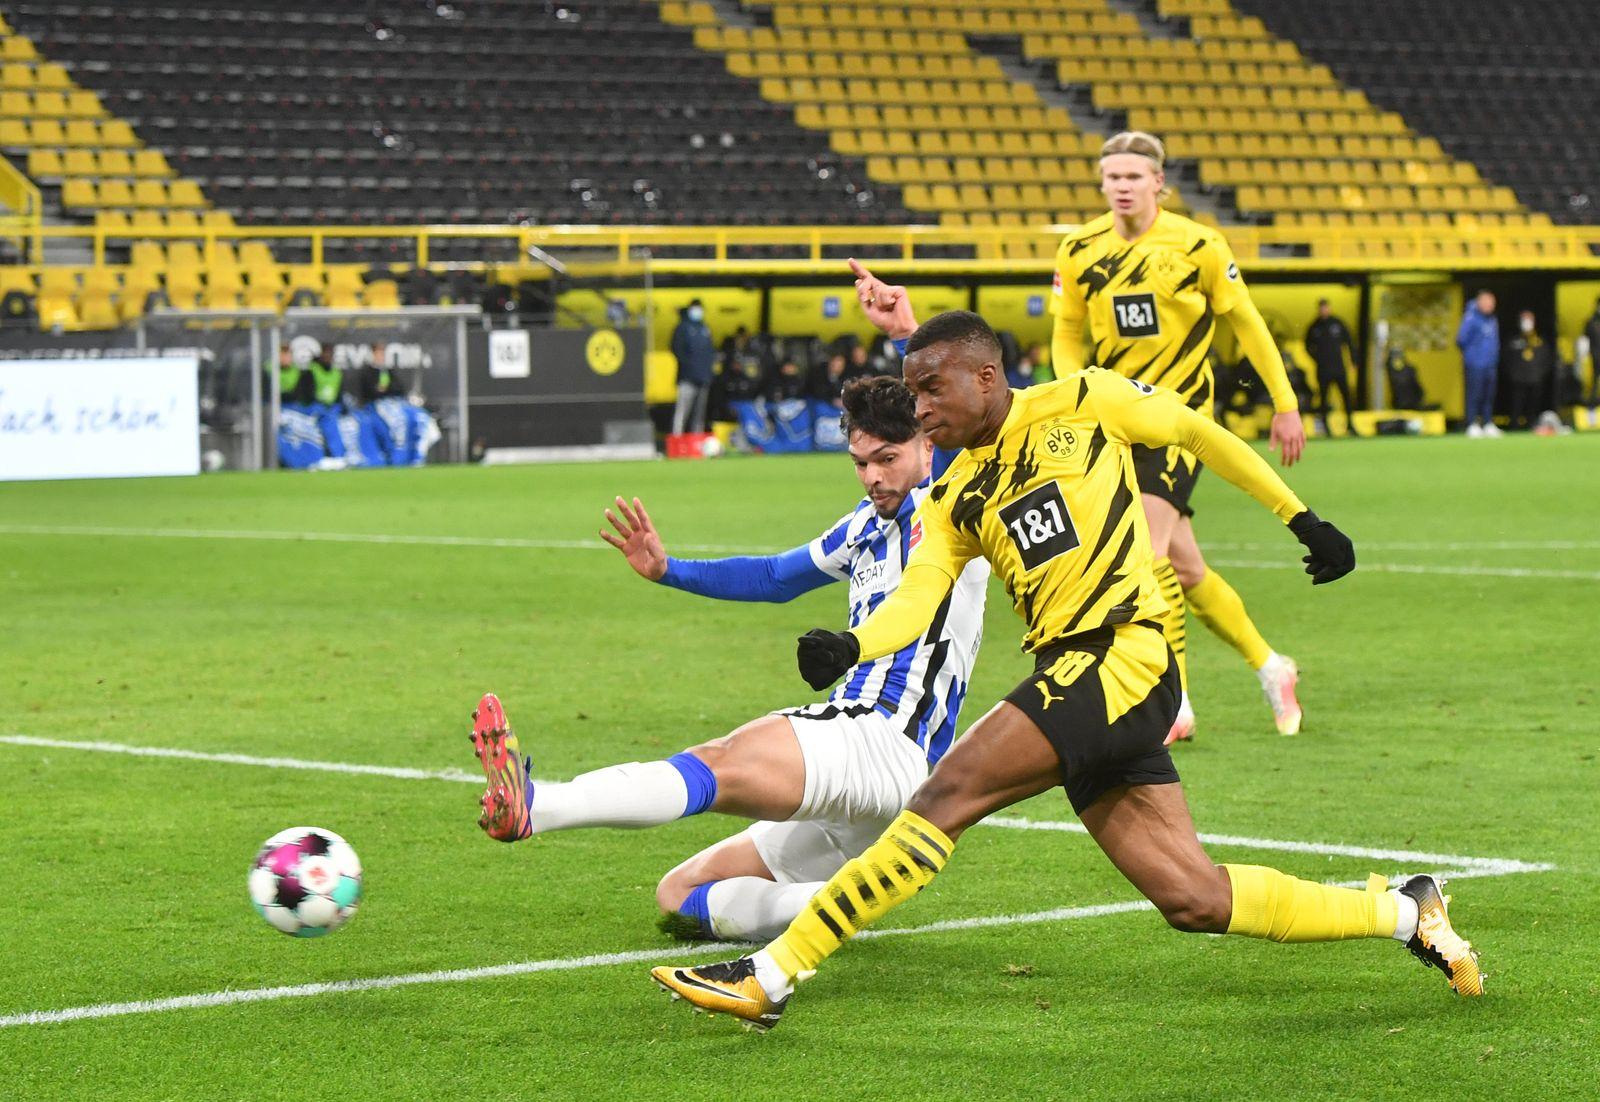 Borussia Dortmund - Hertha BSC